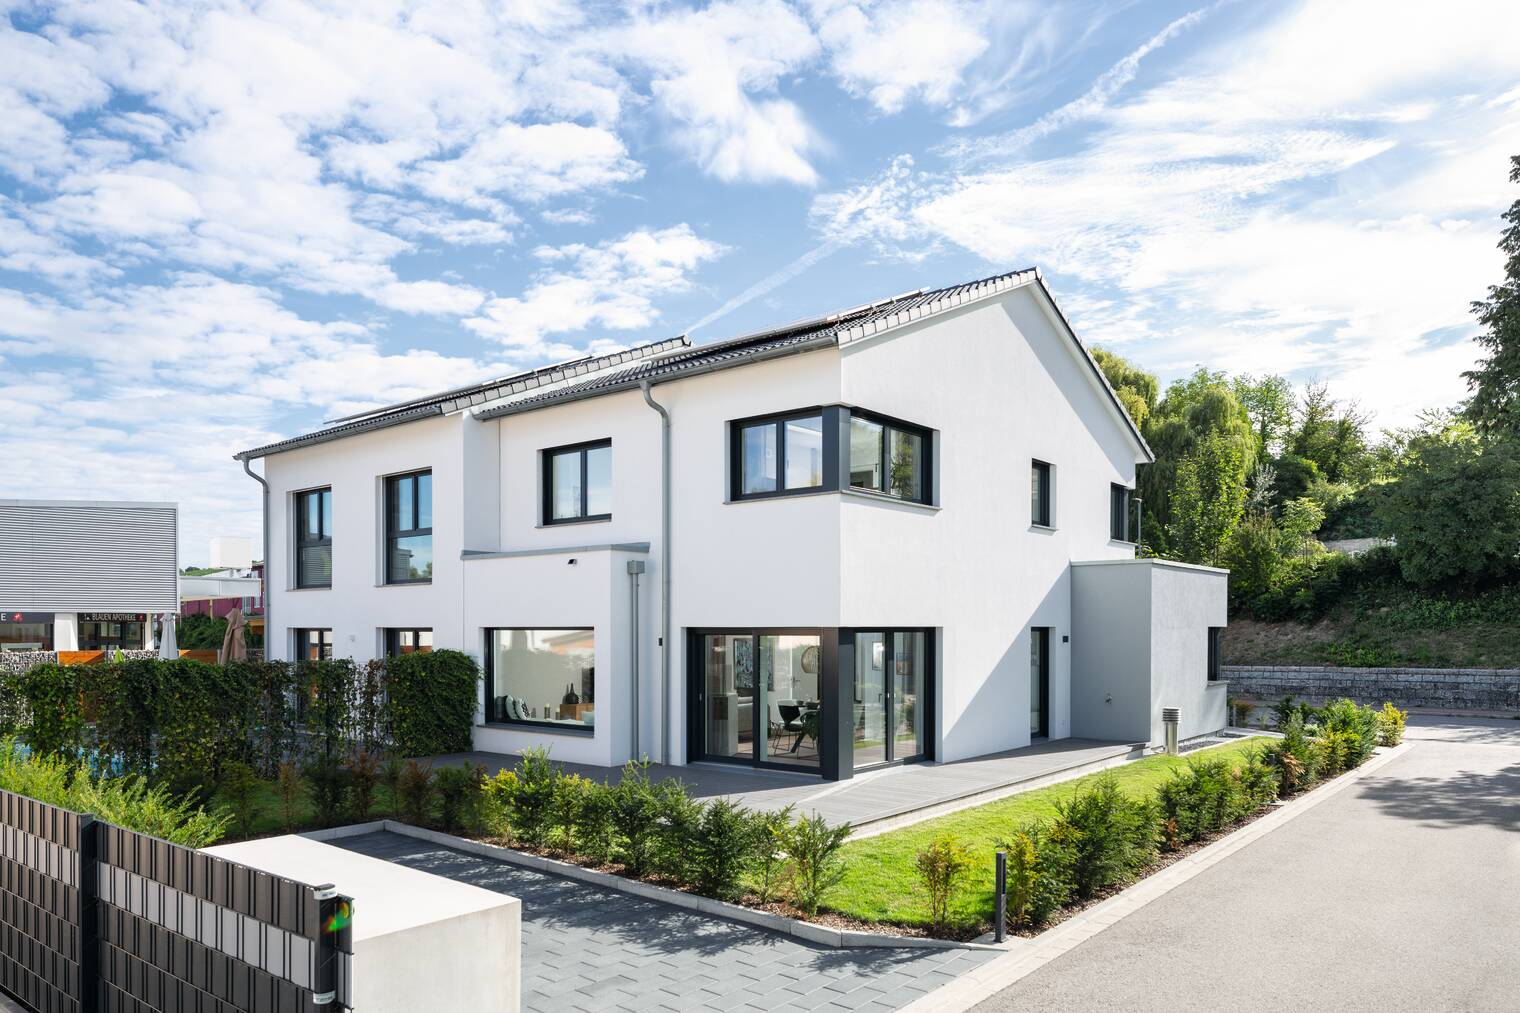 Modernes Doppelhaus Ausstellungshaus Schliengen